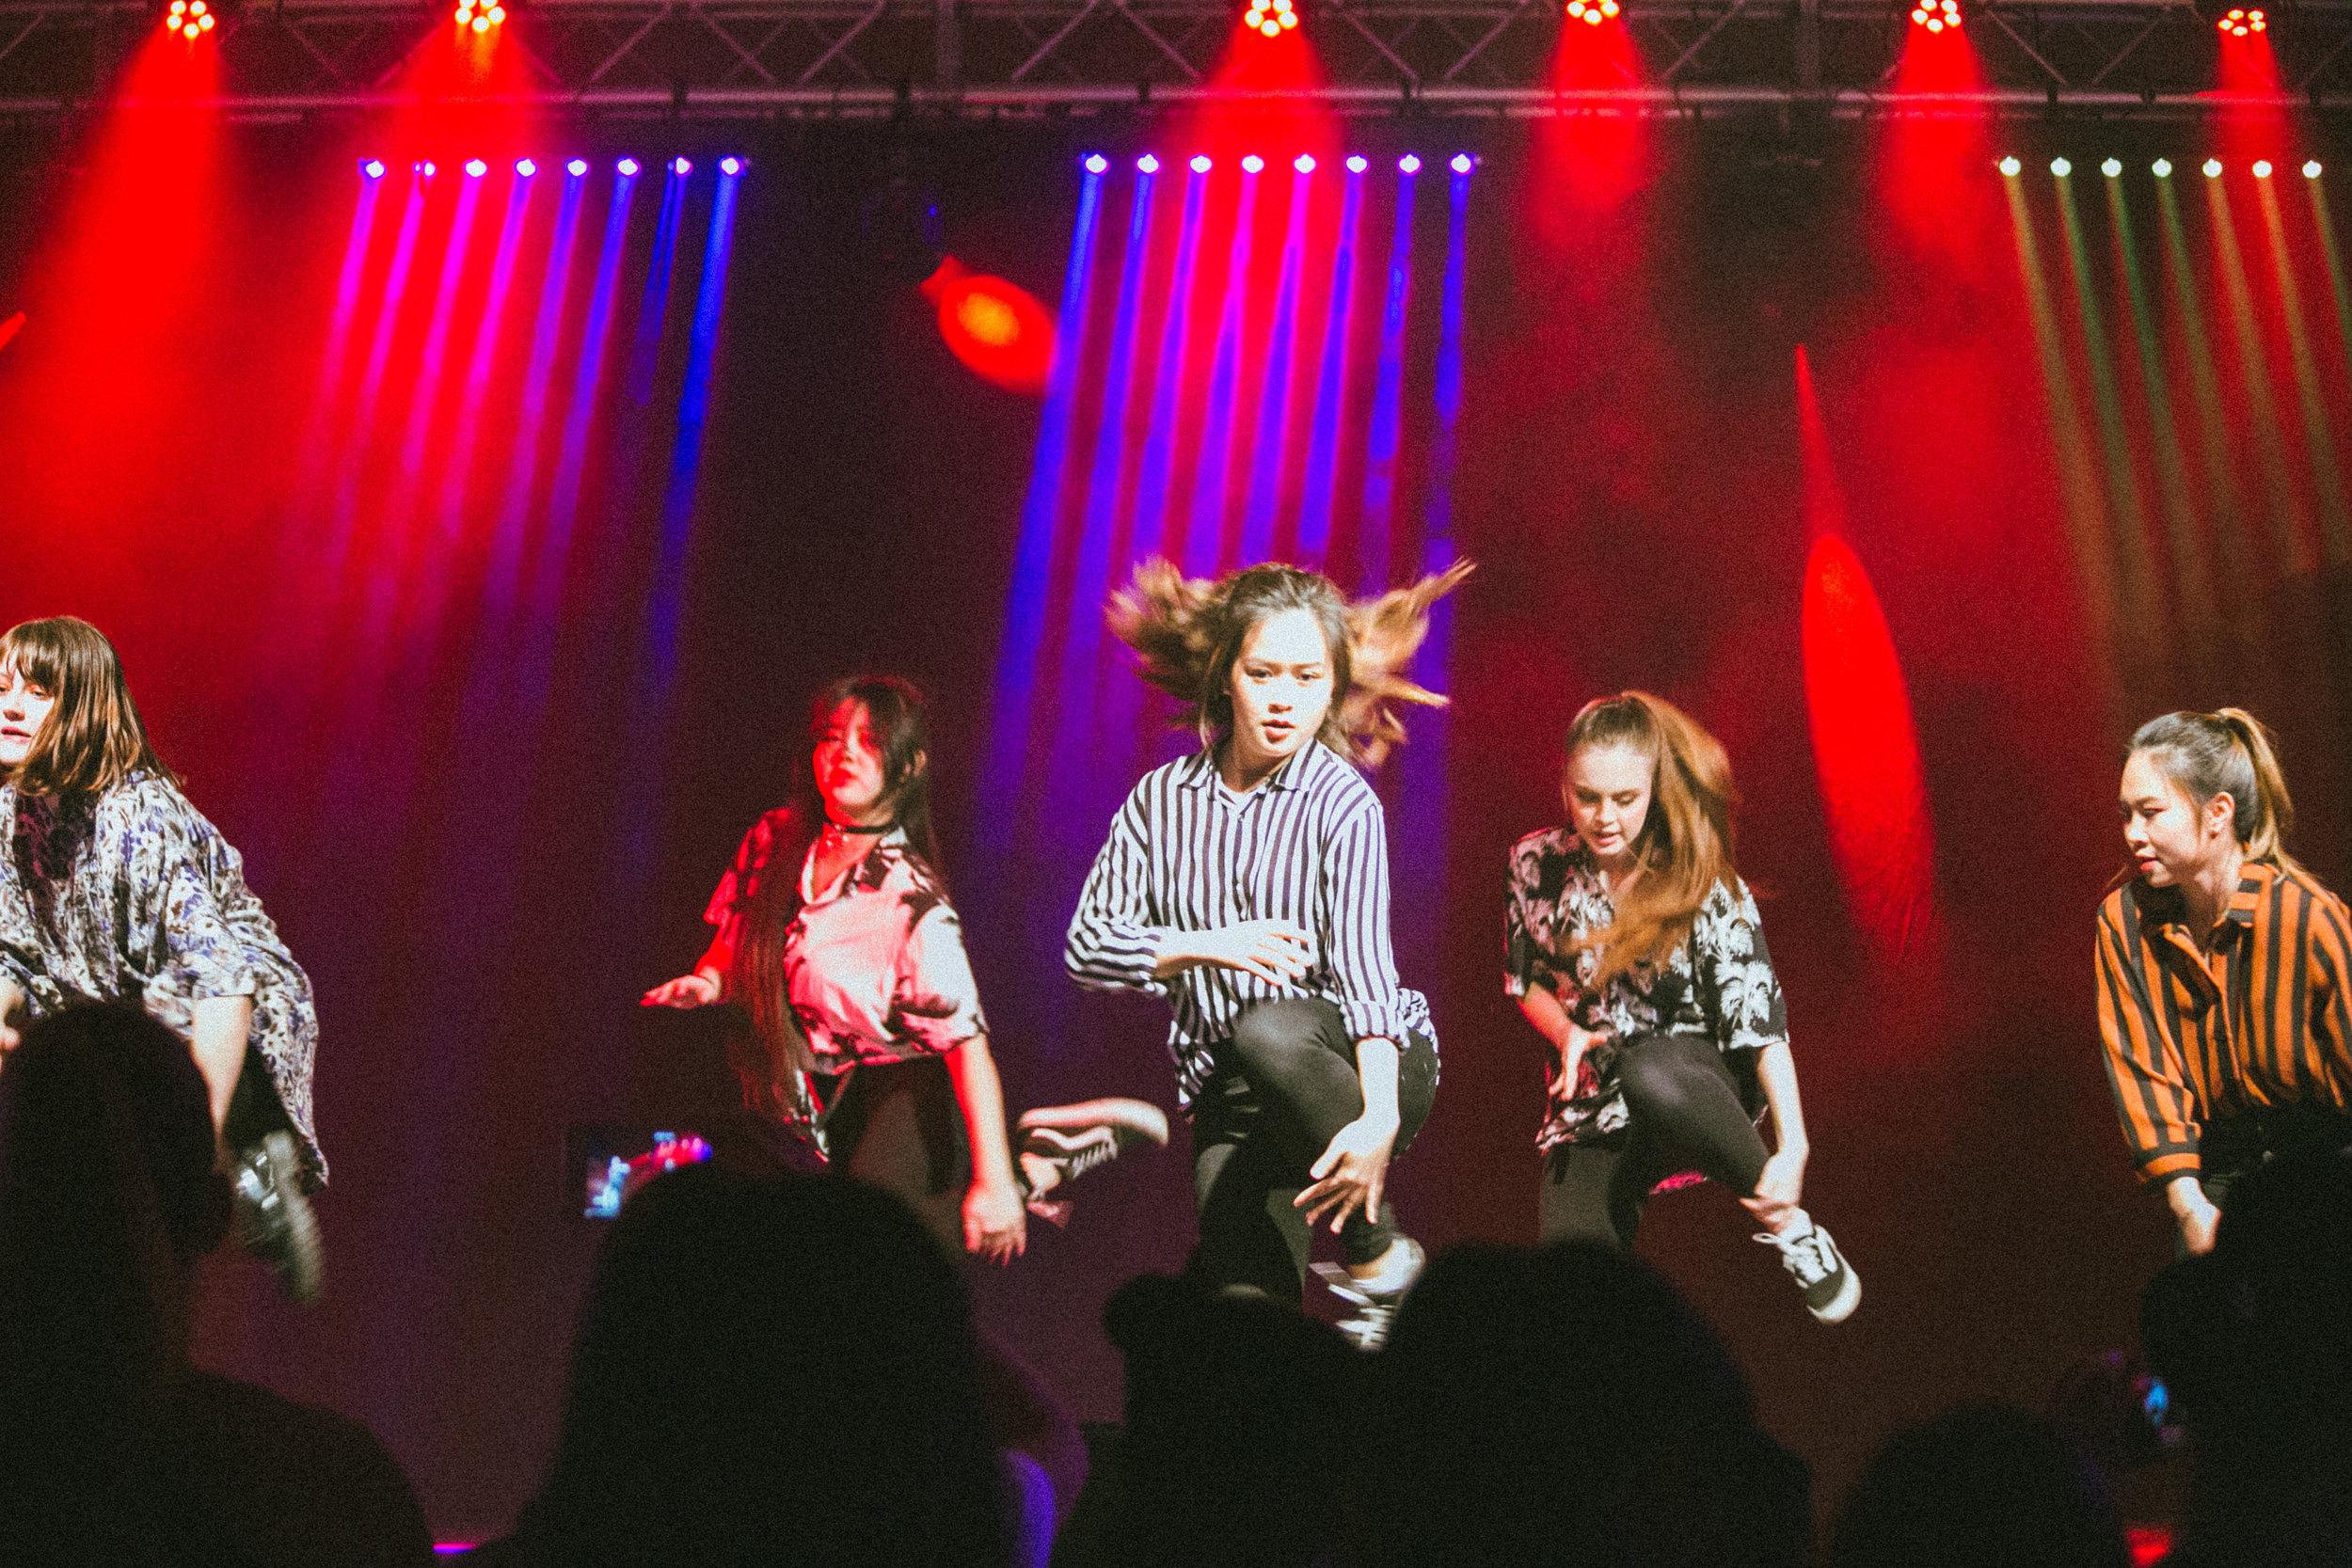 © Kpop Göteborg 2019.  Photographers: Elias Abounakif /  @elibaoo  & Paulina Lee /  @lee.paulina_